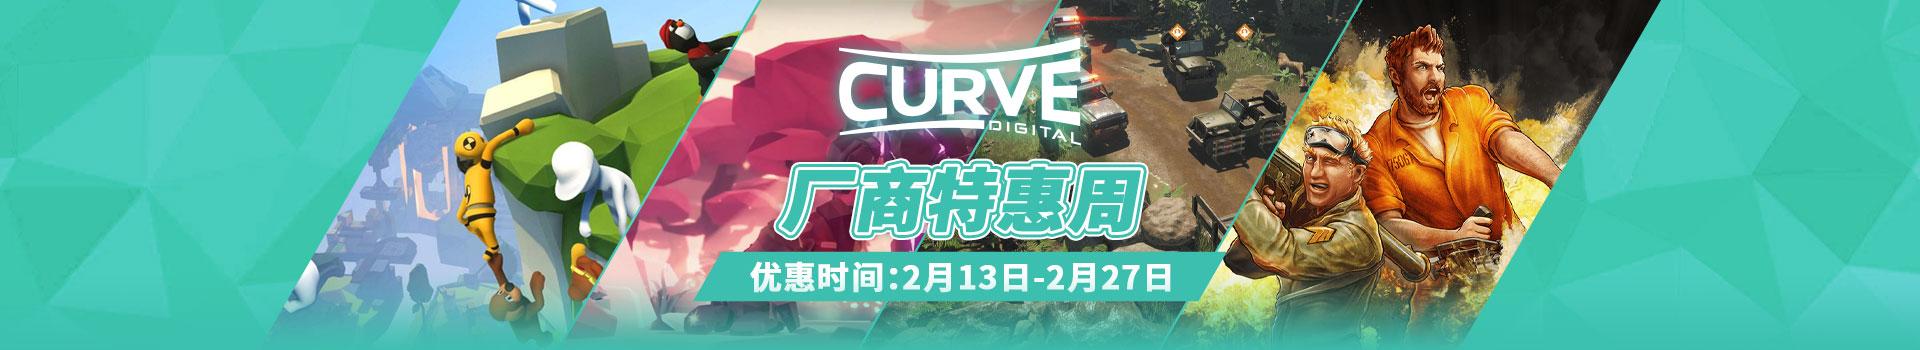 Curve Digital厂商优惠